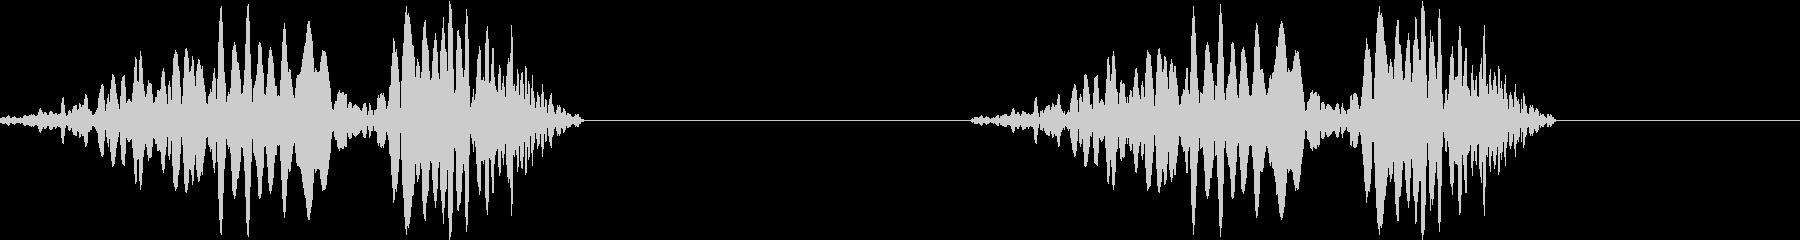 DJプレイ スクラッチ・ノイズ 179の未再生の波形